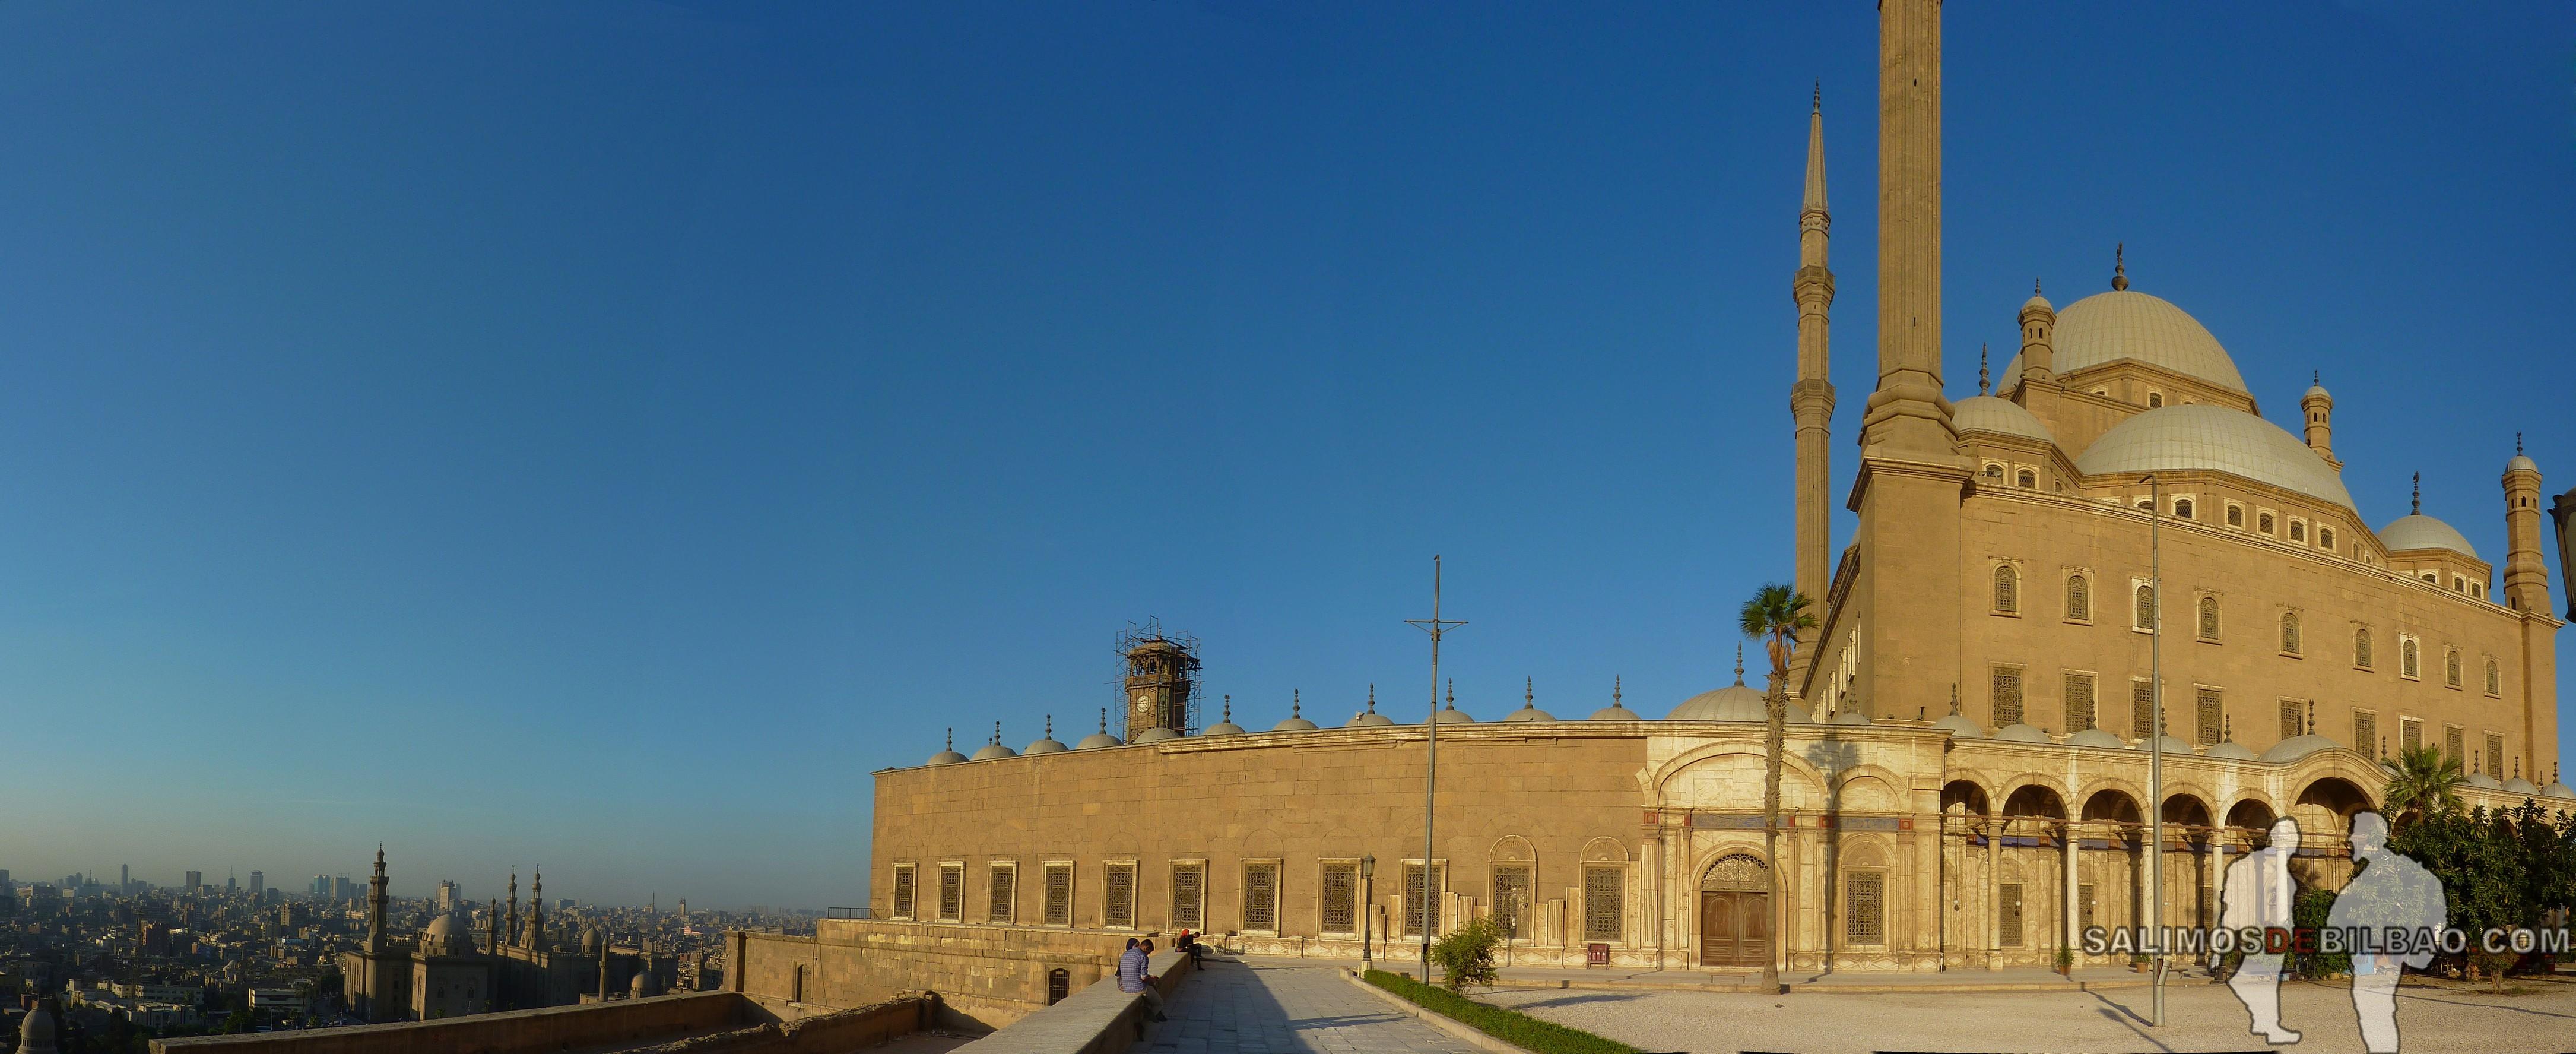 0383. Pano, Ciudadela de Saladino, Cairo